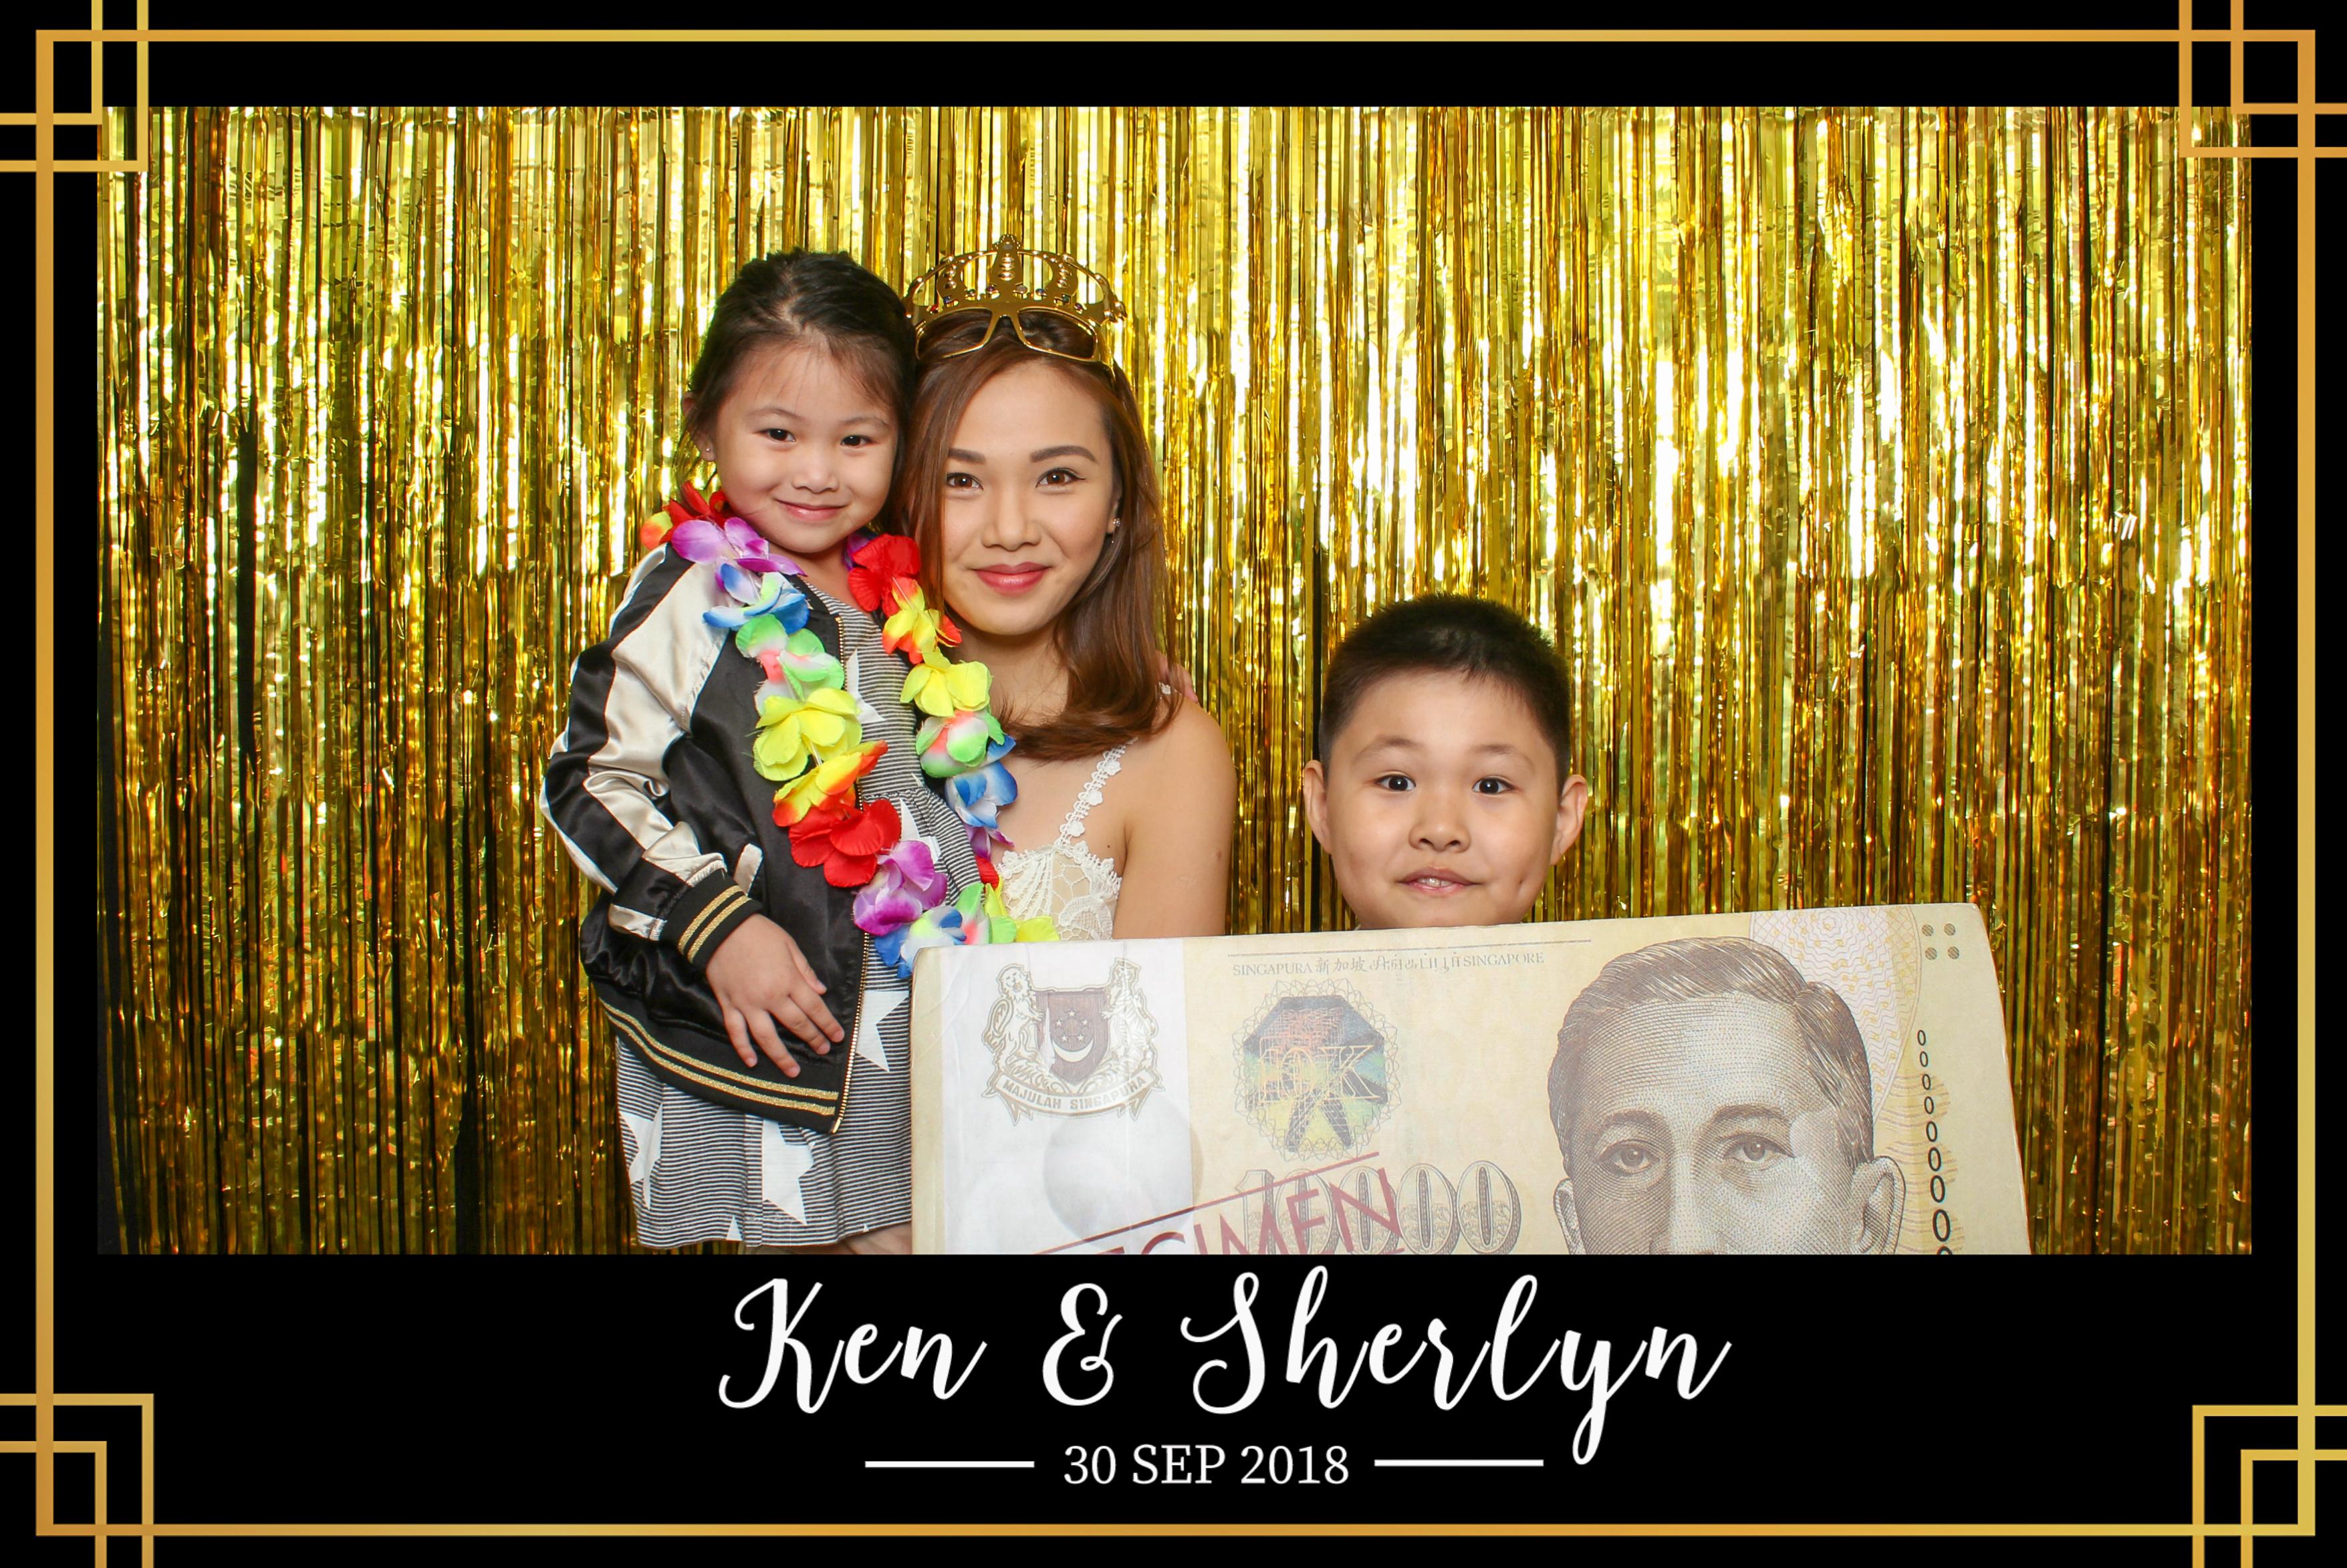 Ken Sherlyn wedding photo booth (35)